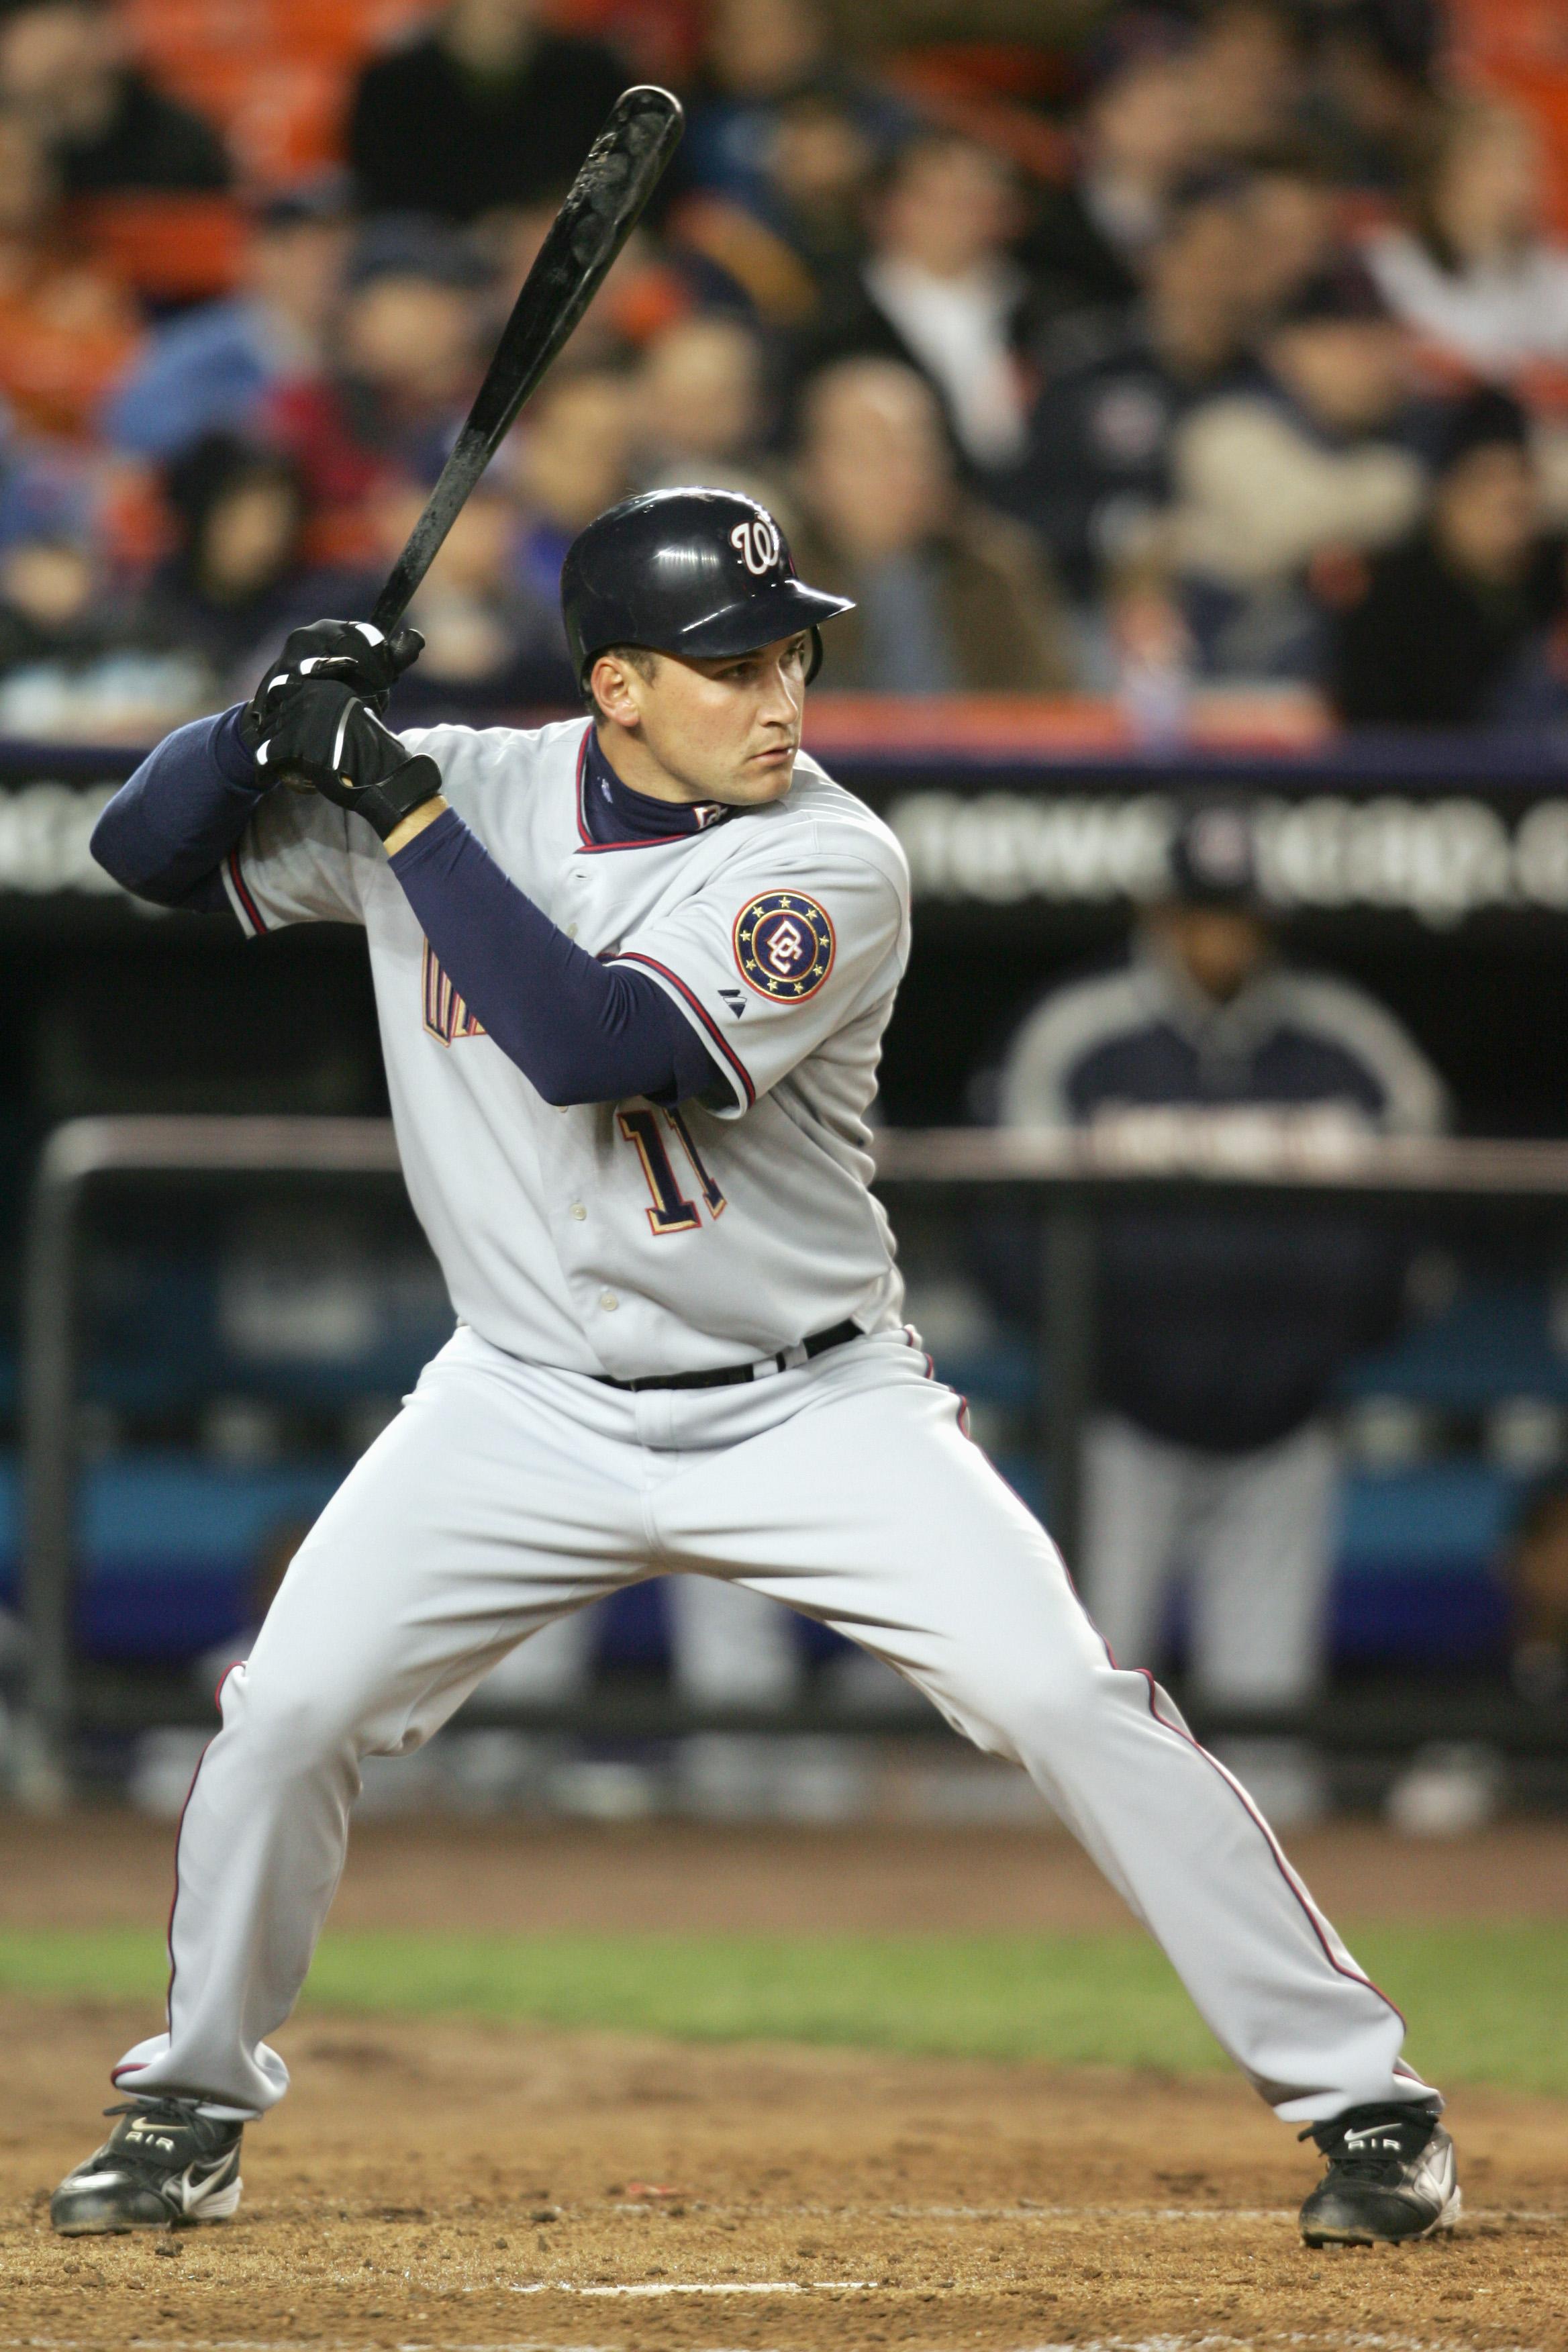 Ryan Zimmerman - the Washington Nationals' third baseman and franchise player